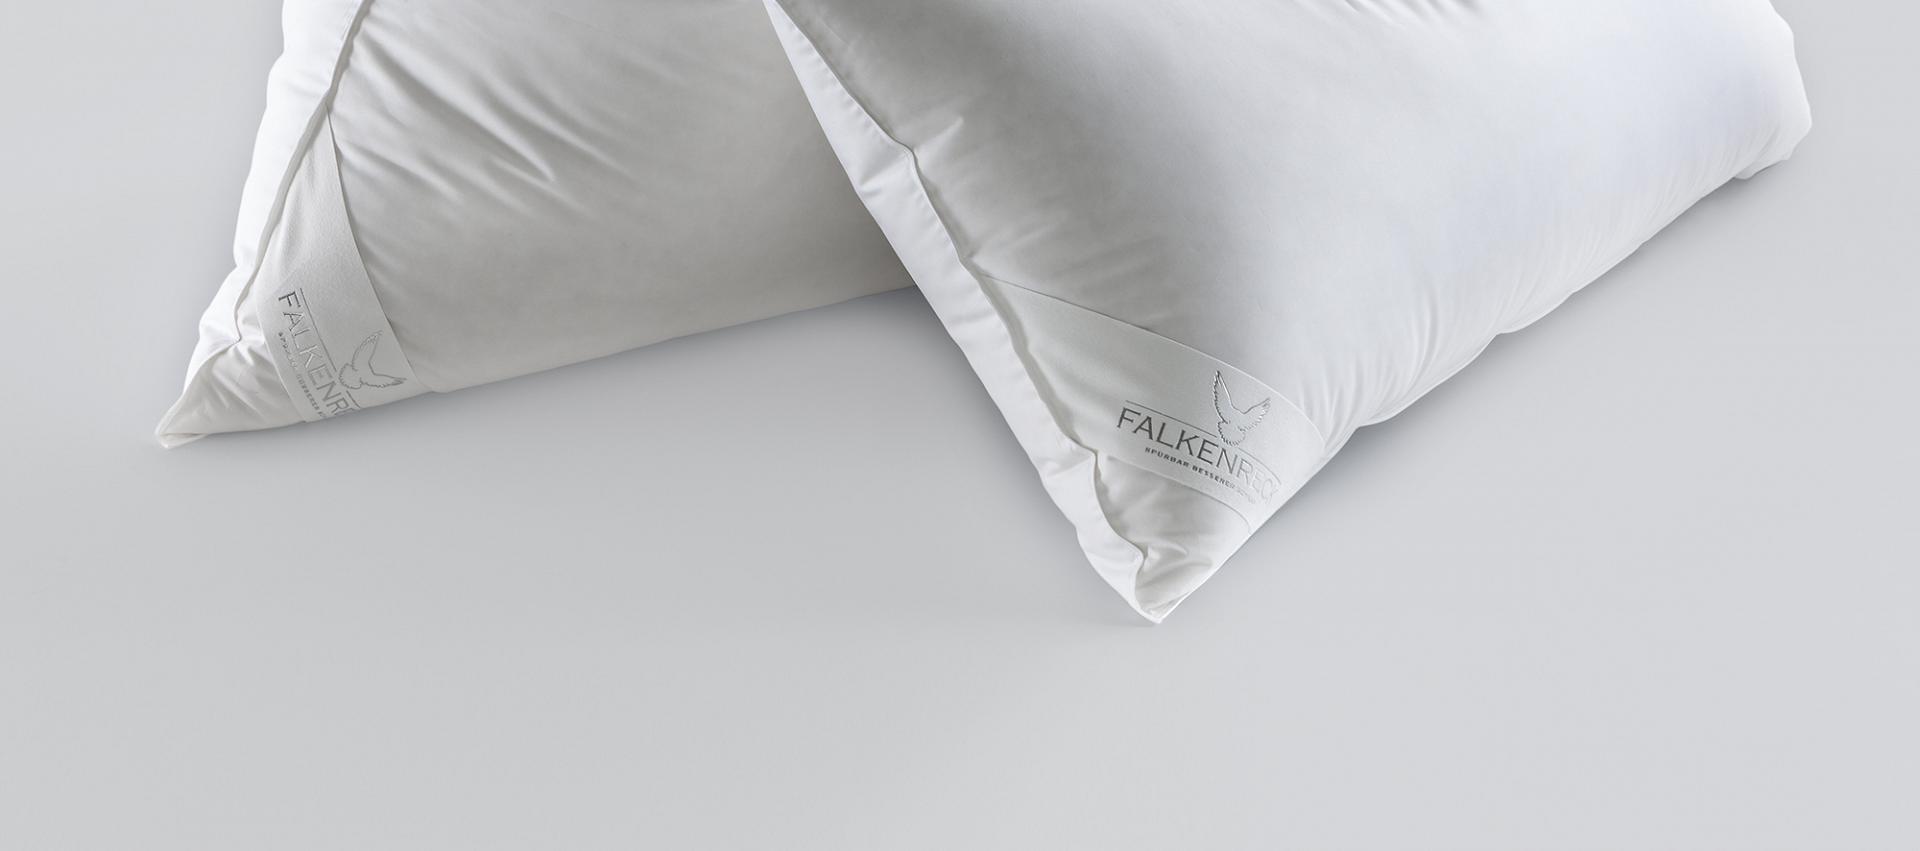 bettdecken eiderdaunen schlafzimmer stinkt trotz l ften kopfkissen gegen kopfschmerzen flieder. Black Bedroom Furniture Sets. Home Design Ideas